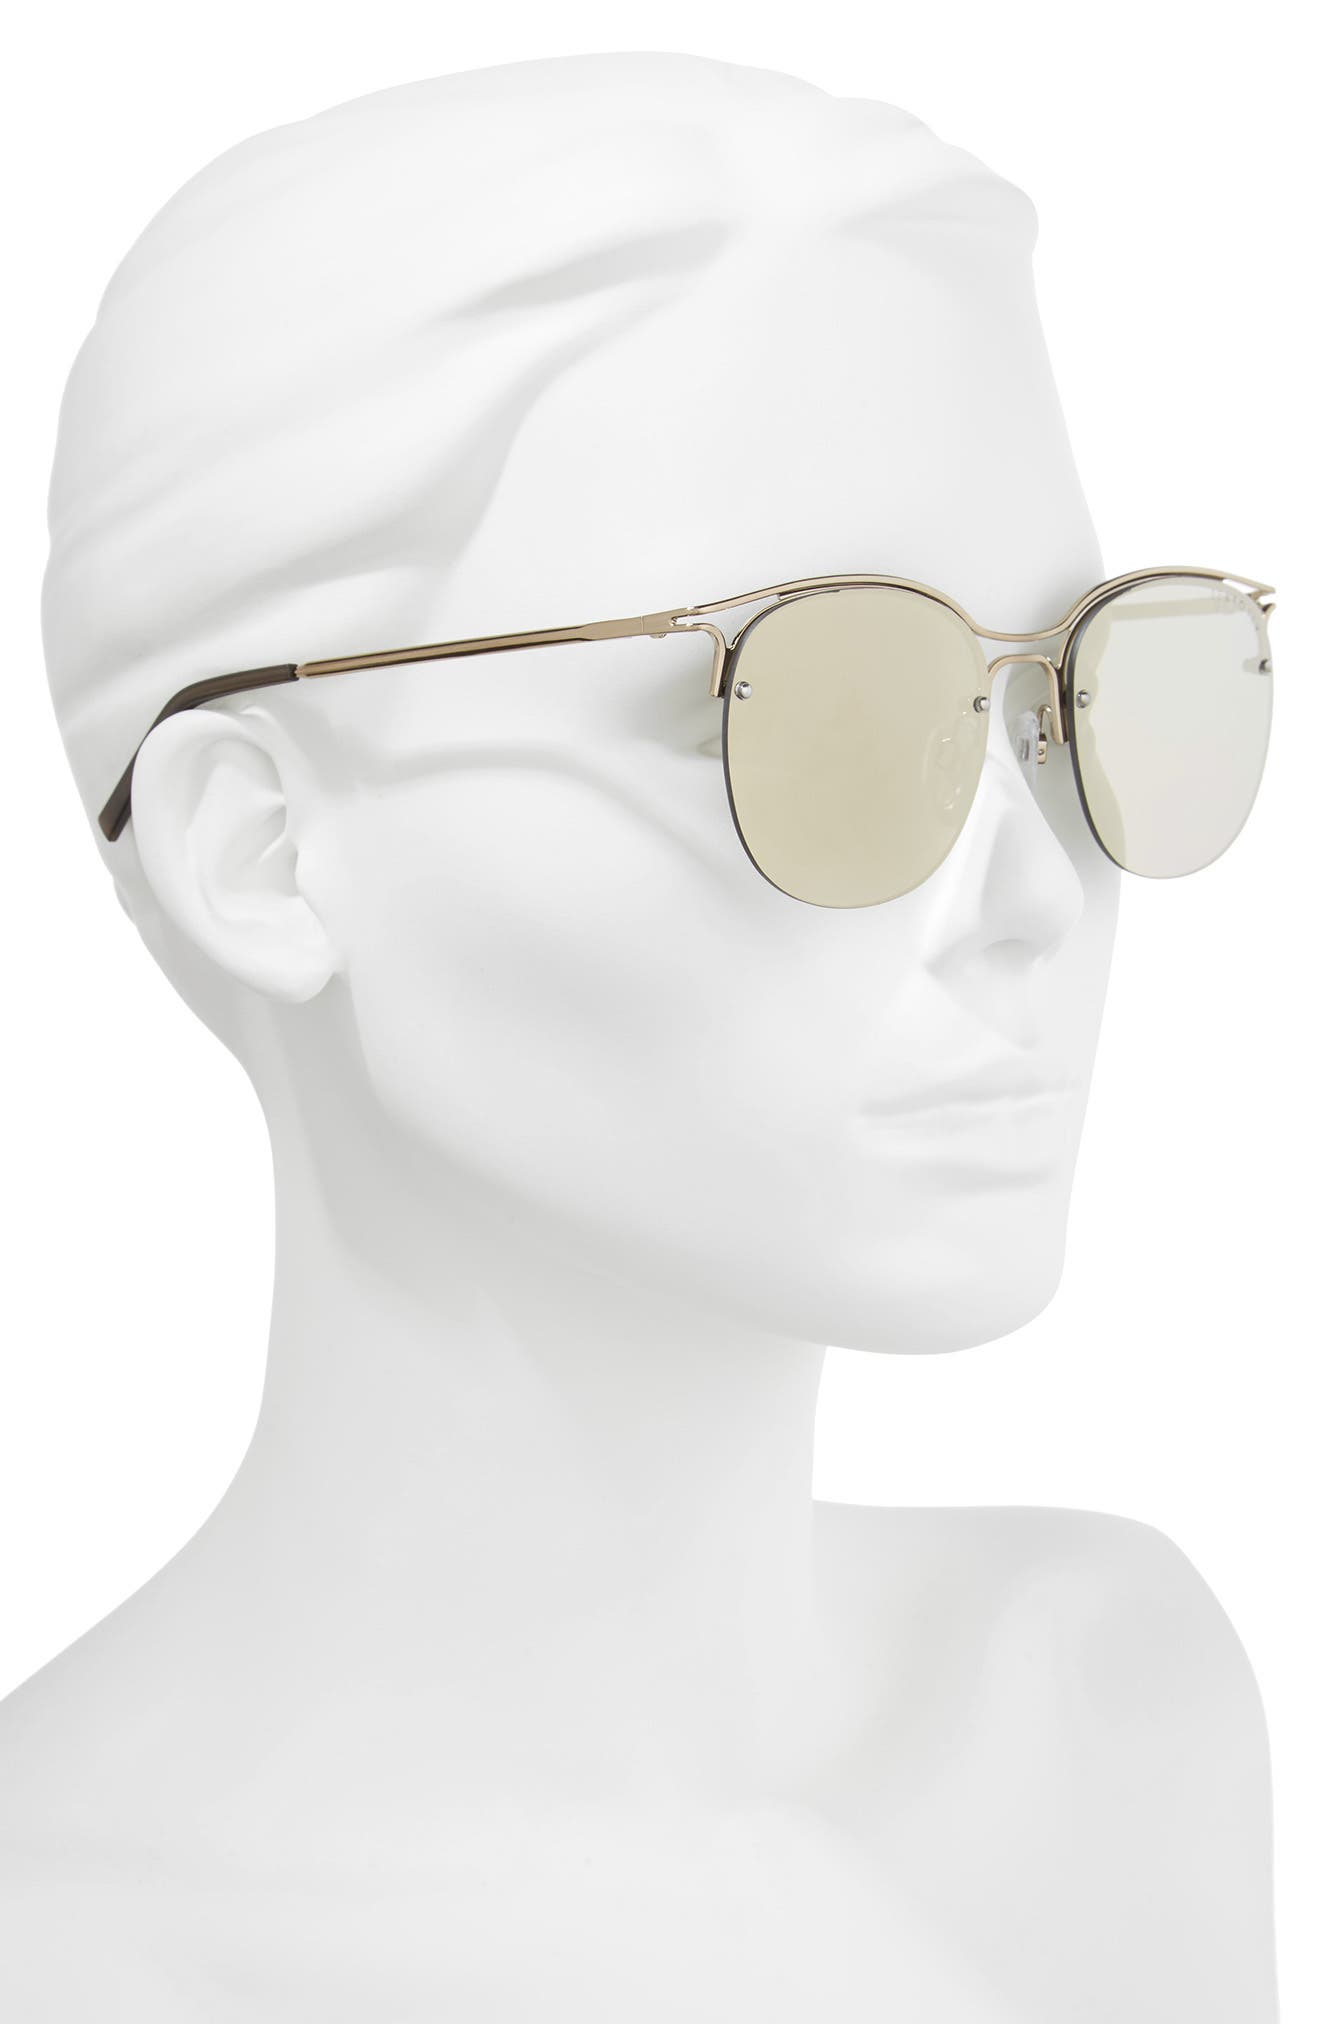 Freshwater 55m Metal Sunglasses,                             Alternate thumbnail 3, color,